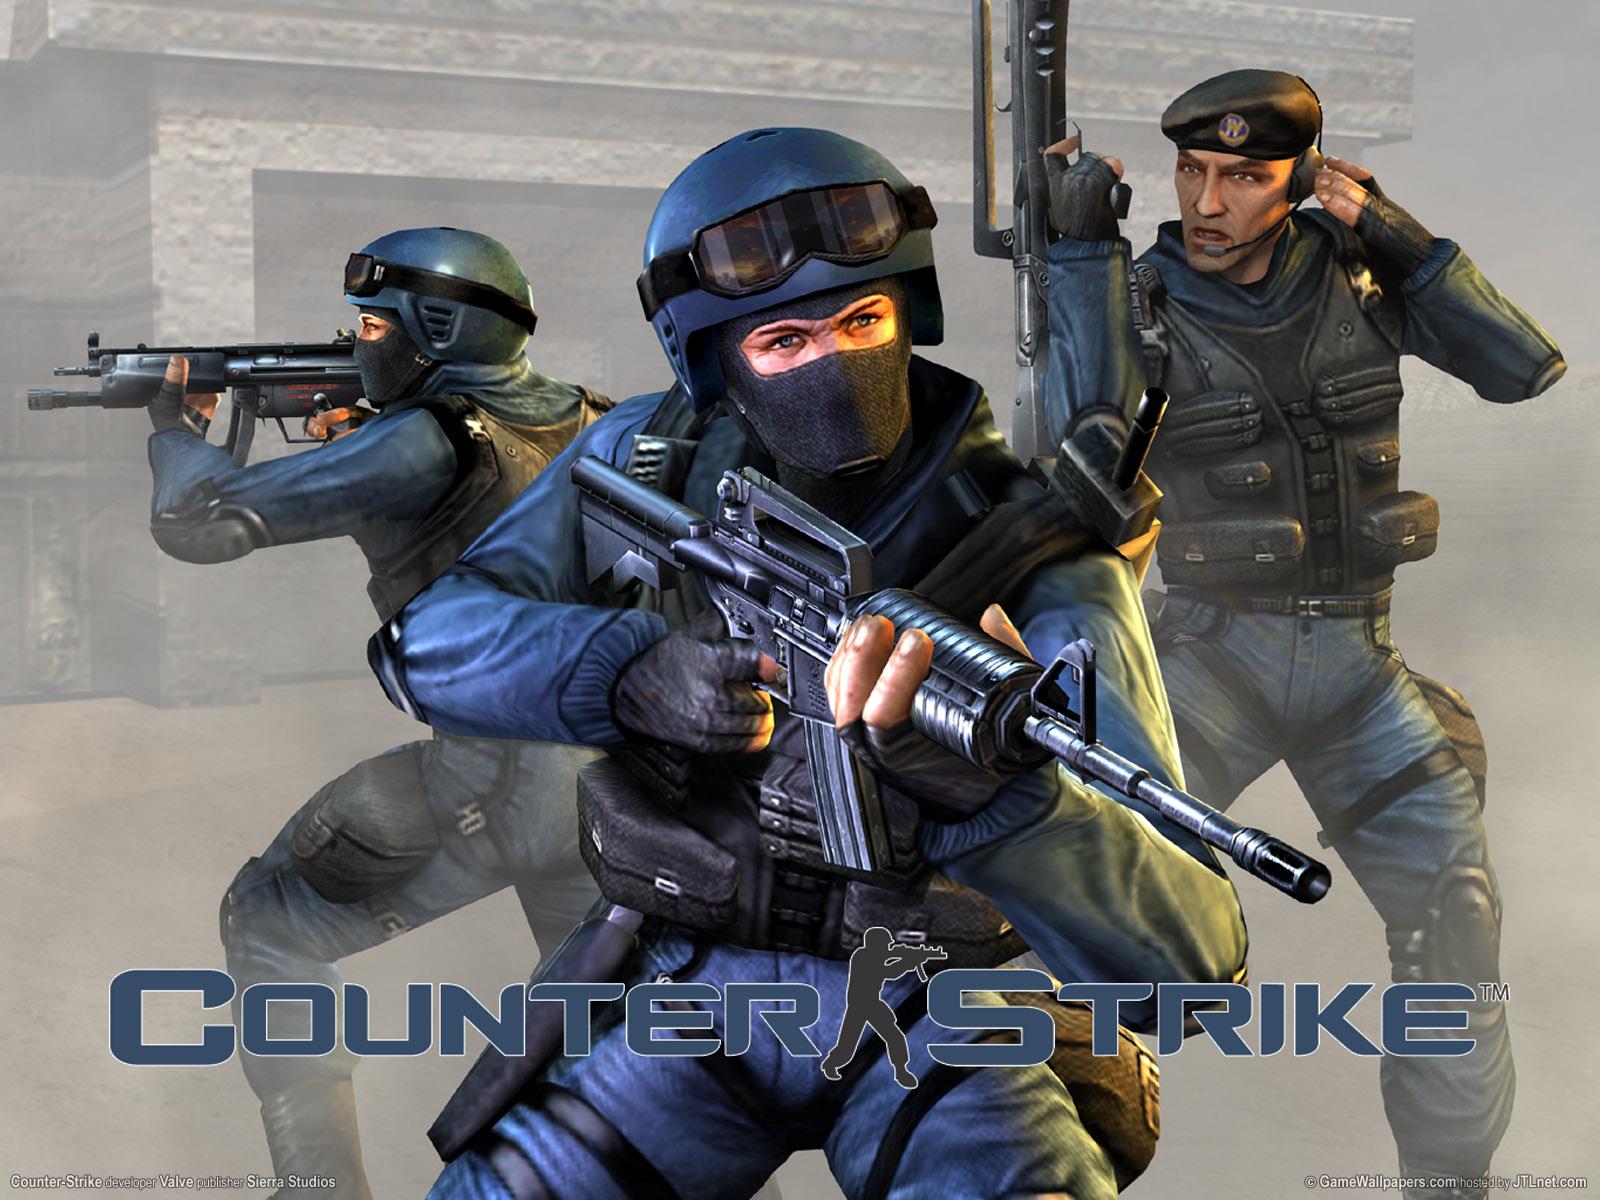 Description: Counter-Strike-1.6-Free-Download Download game petualangan tembak tembakan android counter strike 1.6